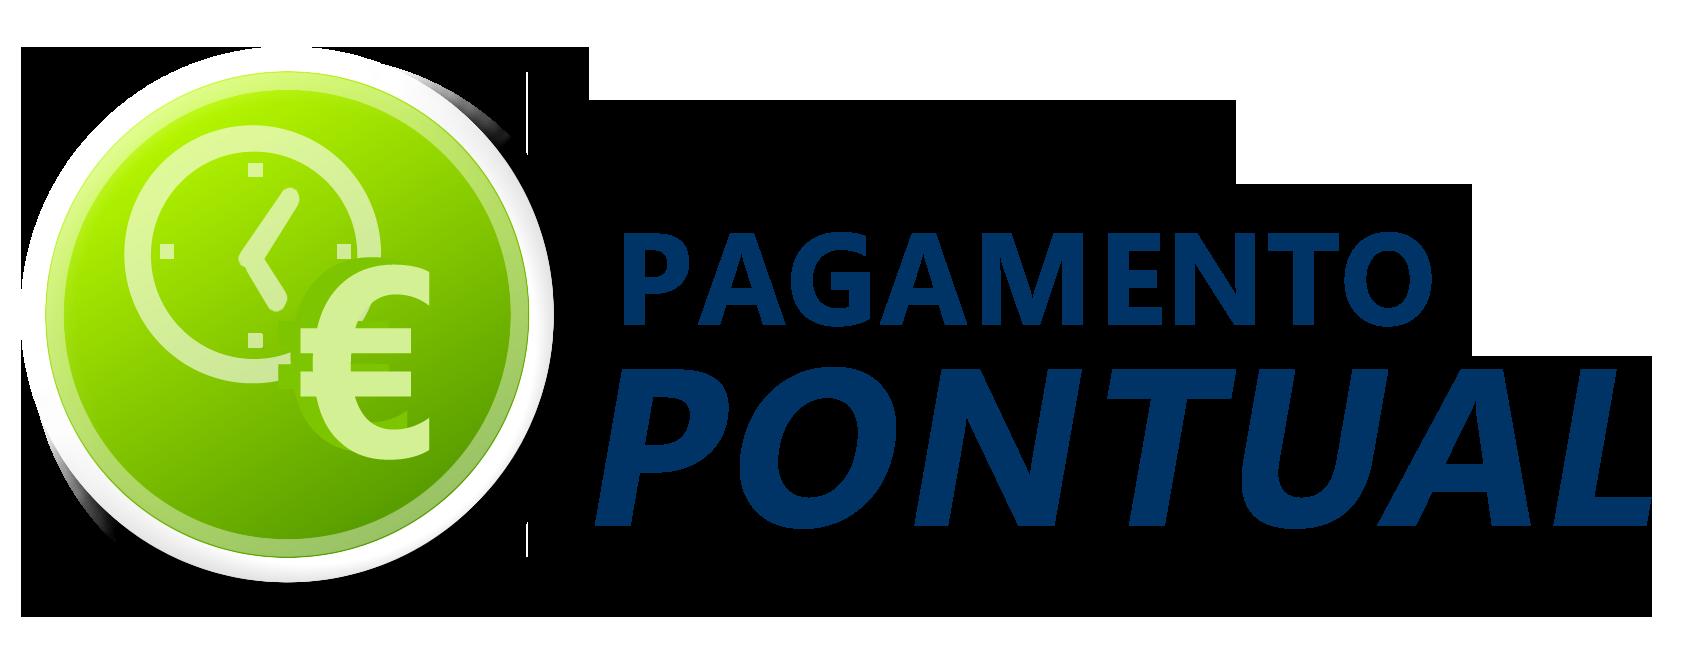 PPontual